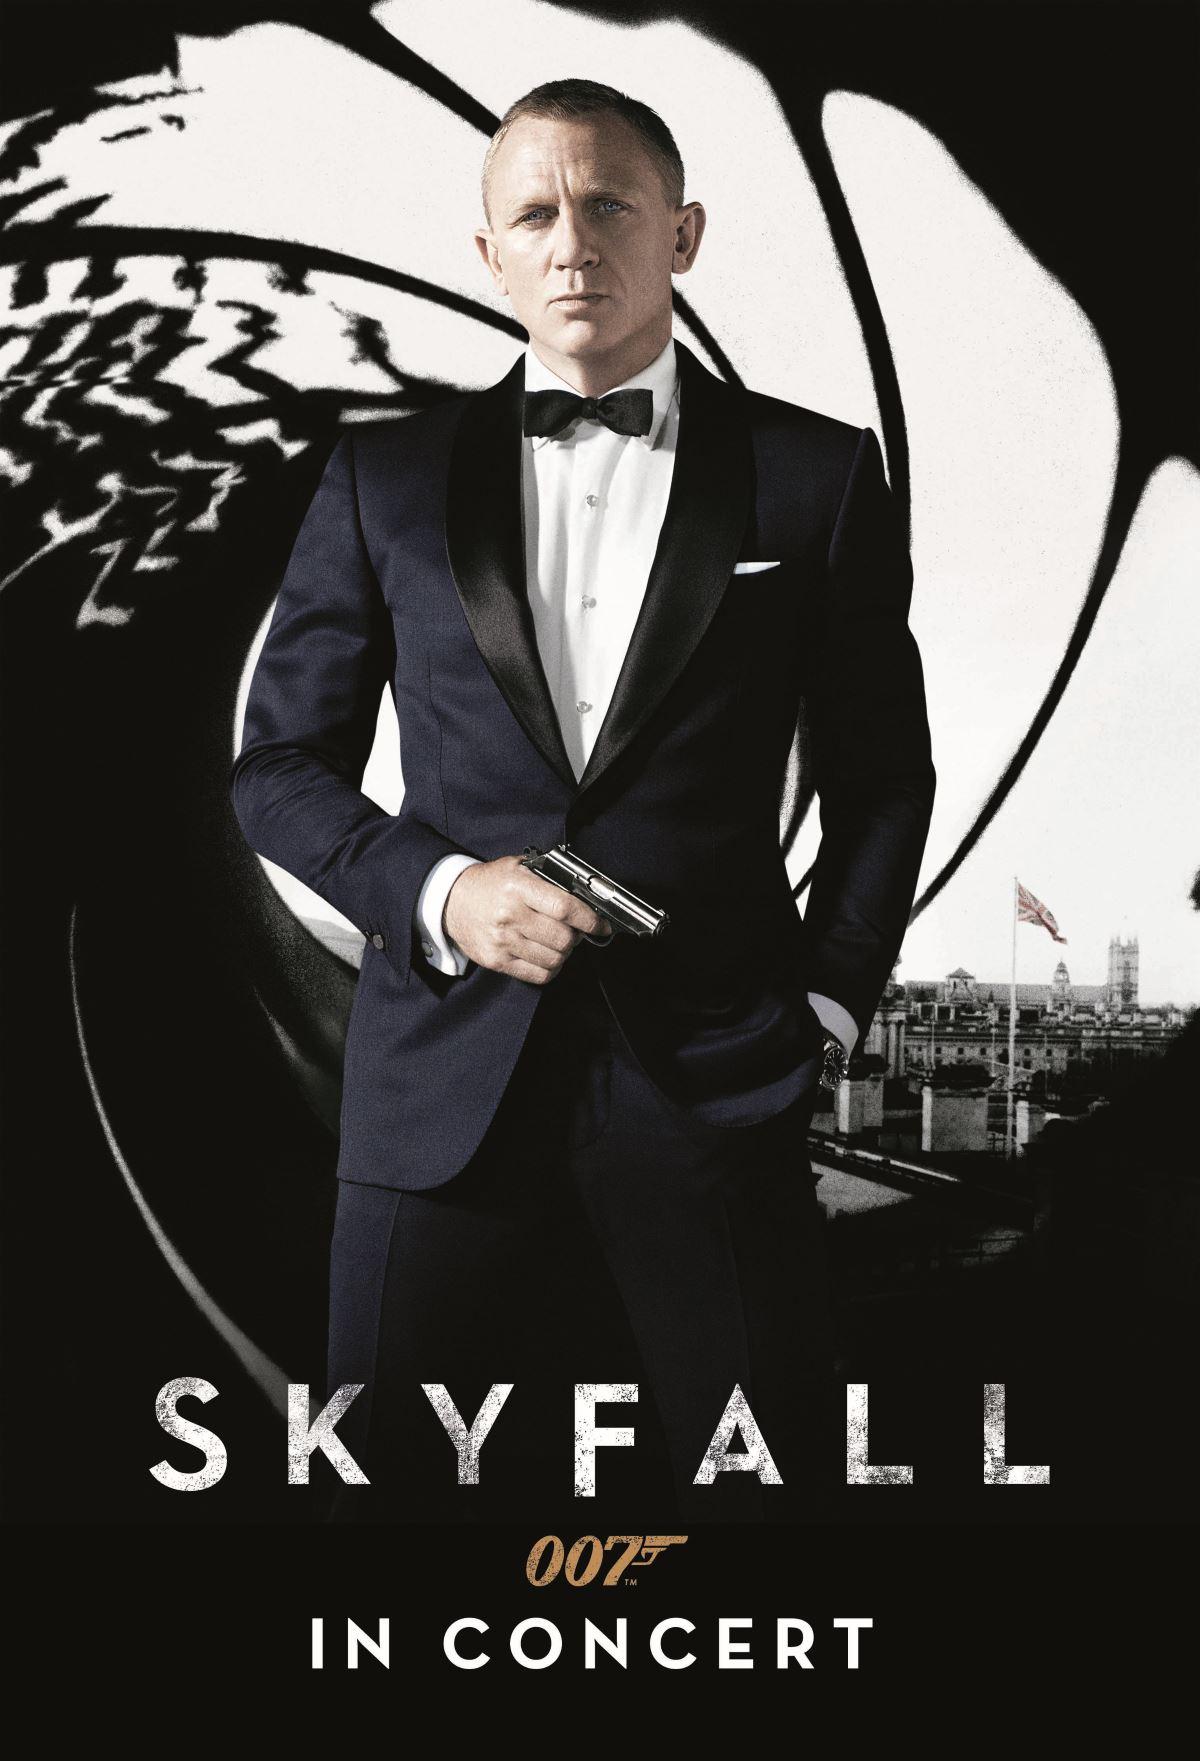 skyfall_blue_tux_poster_1200x1761.jpg